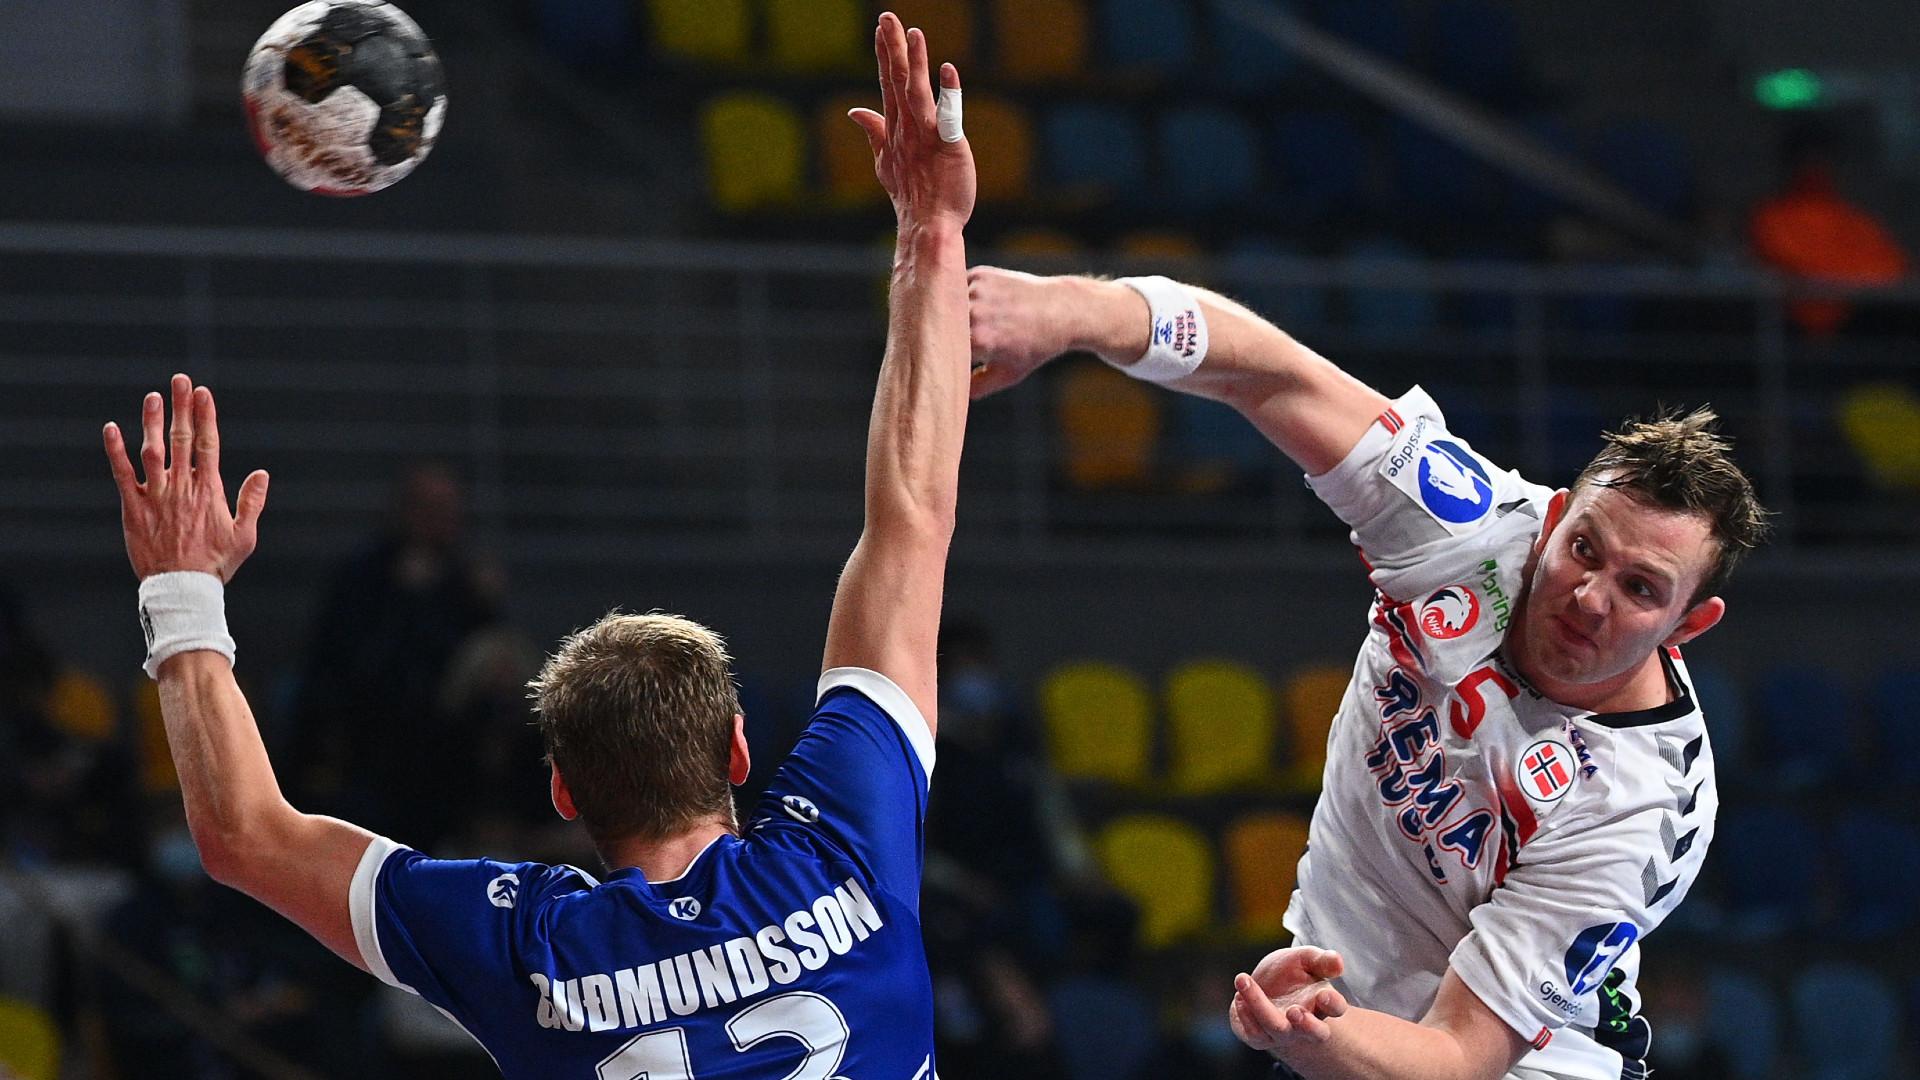 Handball Wm Finale Live Ticker